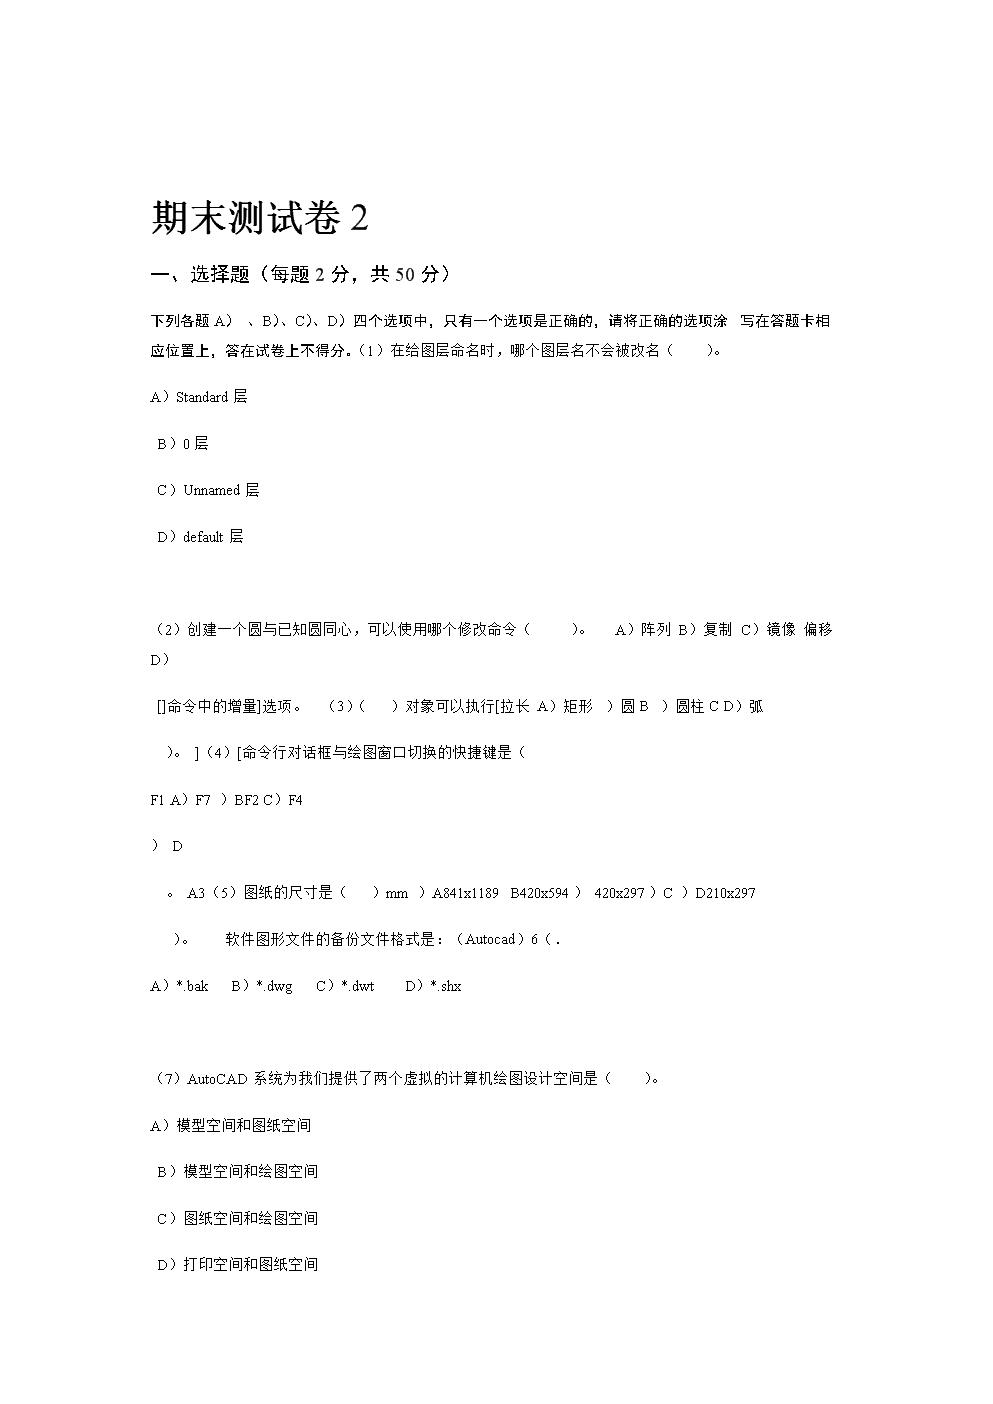 AutoCAD 2010中文版應用教程測試卷2.doc